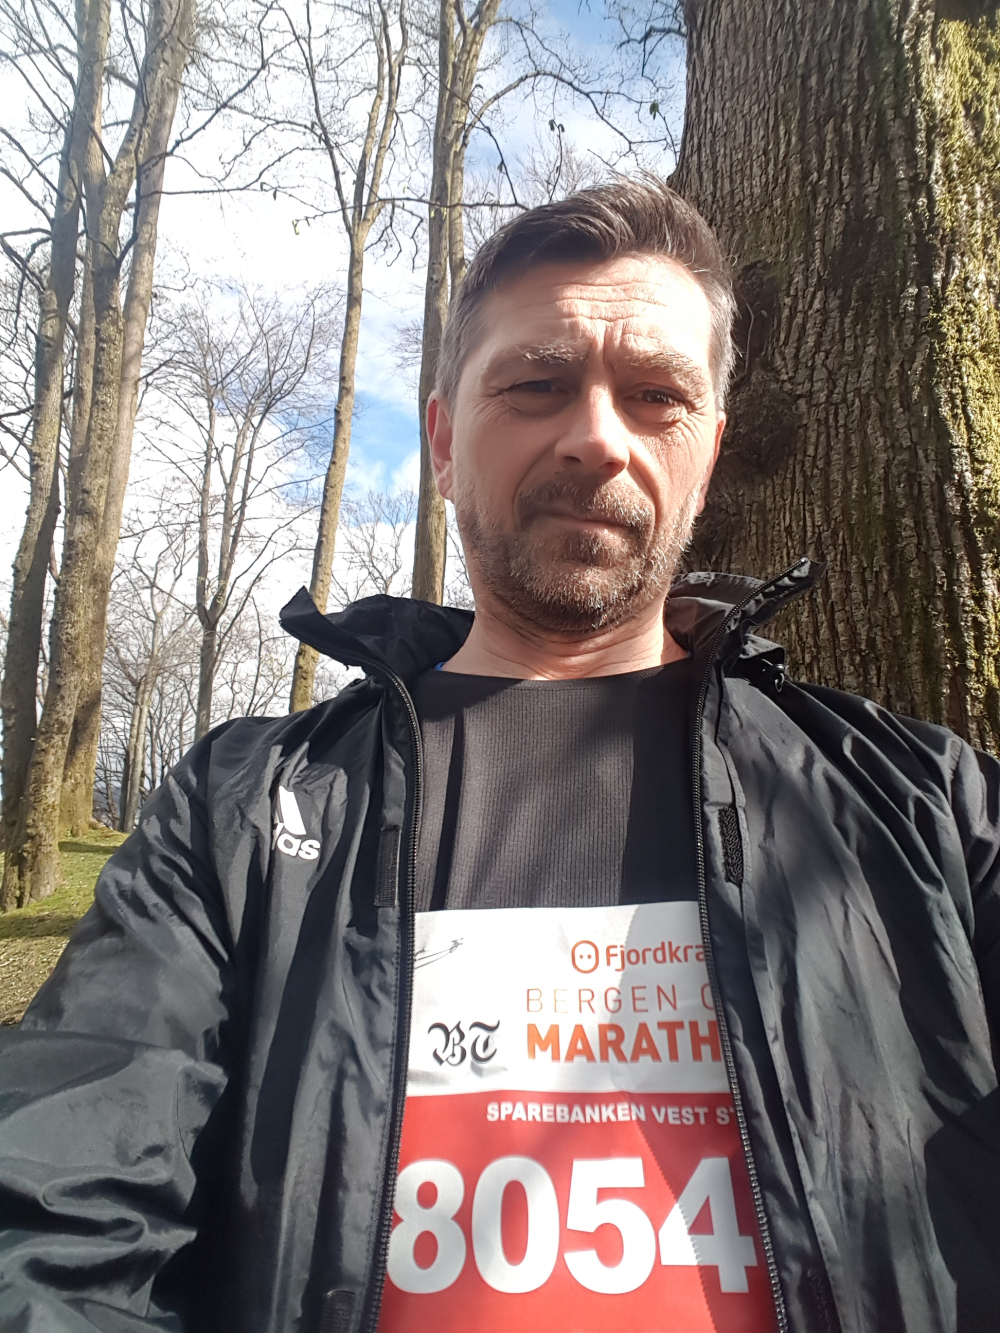 Bergen City Maraton